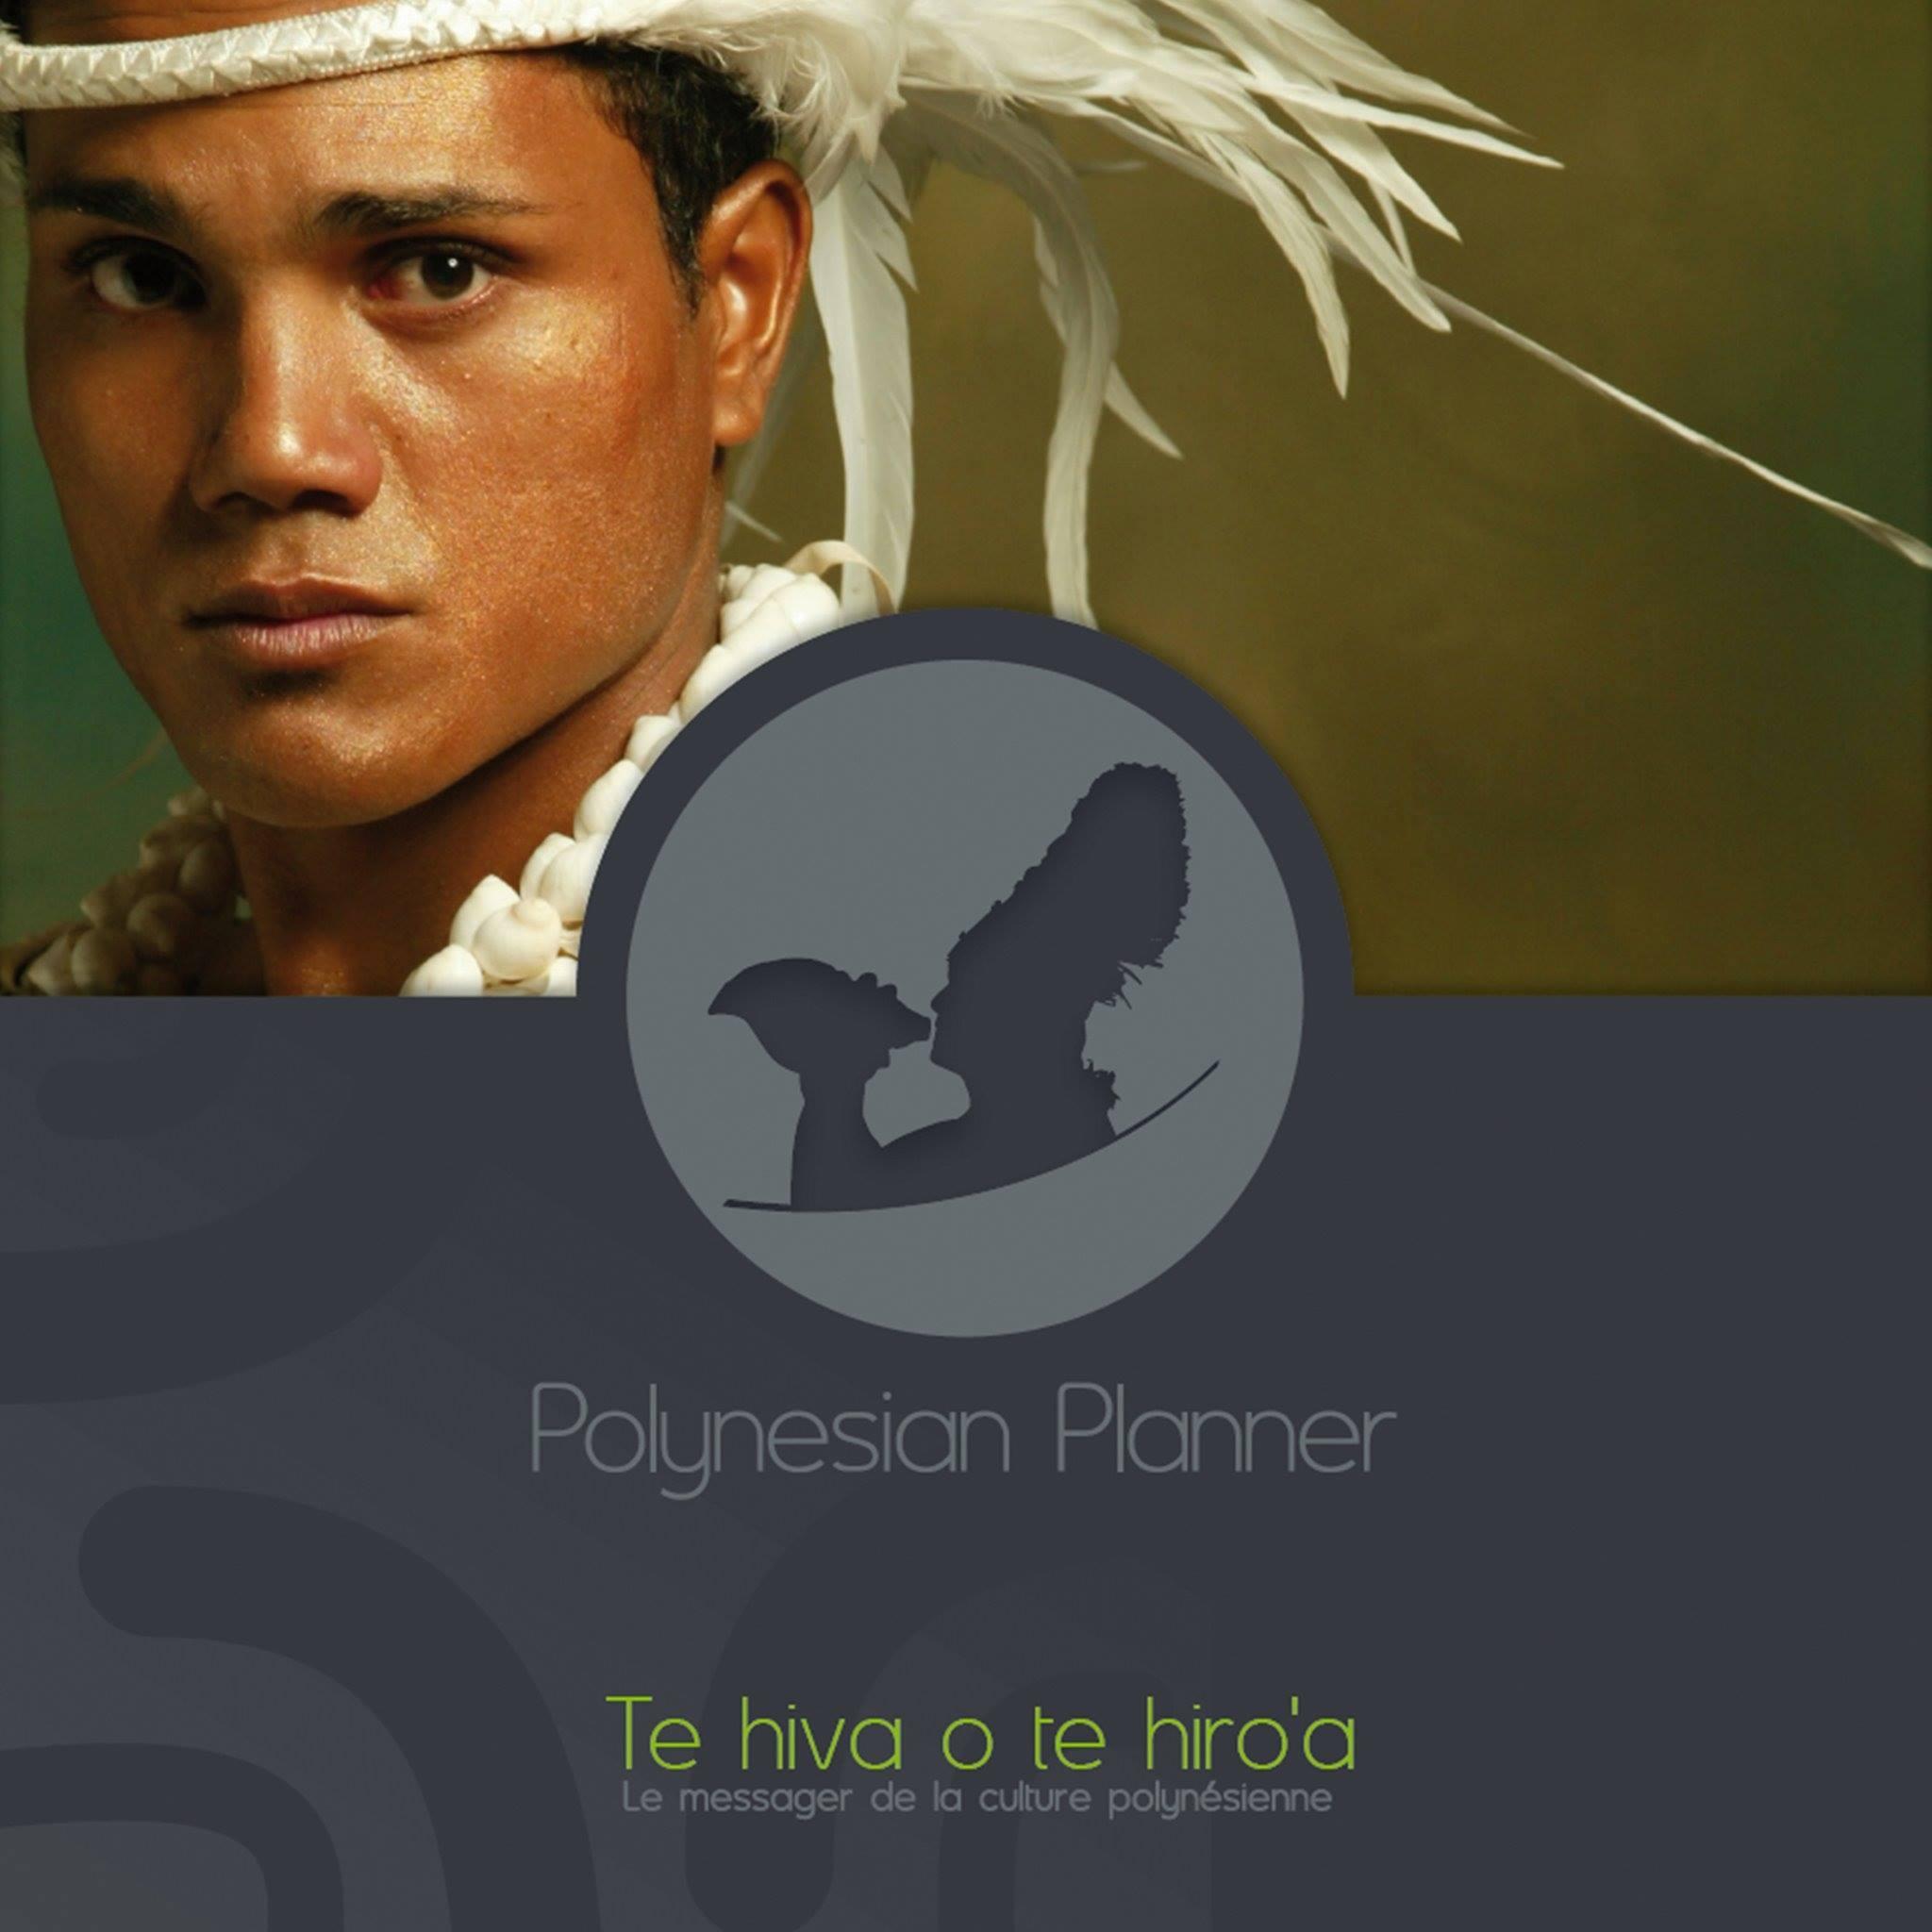 https://tahititourisme.es/wp-content/uploads/2017/08/polynesianplannerphotodeprofil.jpg